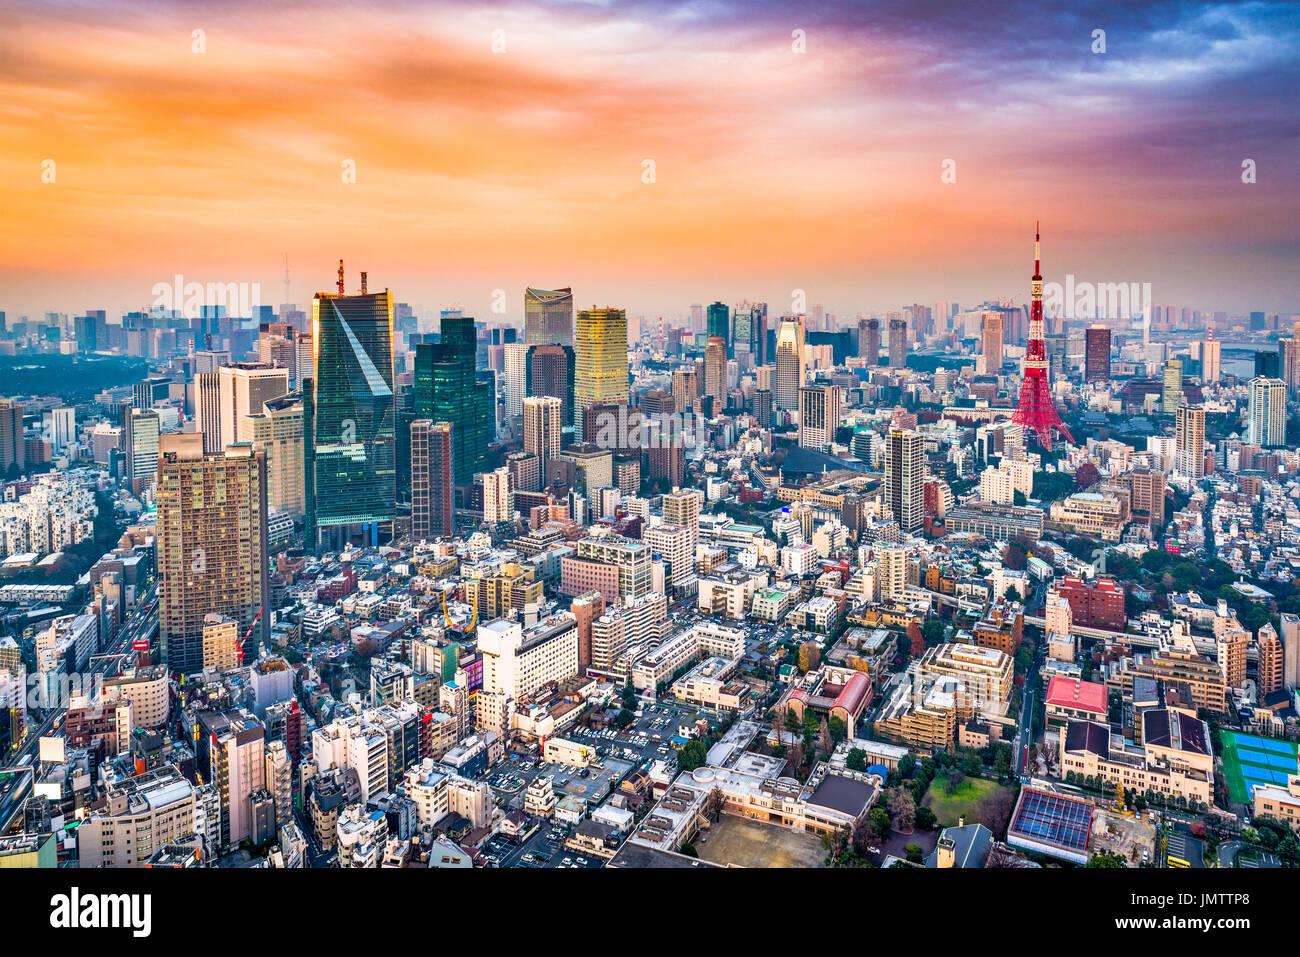 Tokyo, Japan skyline. - Stock Image